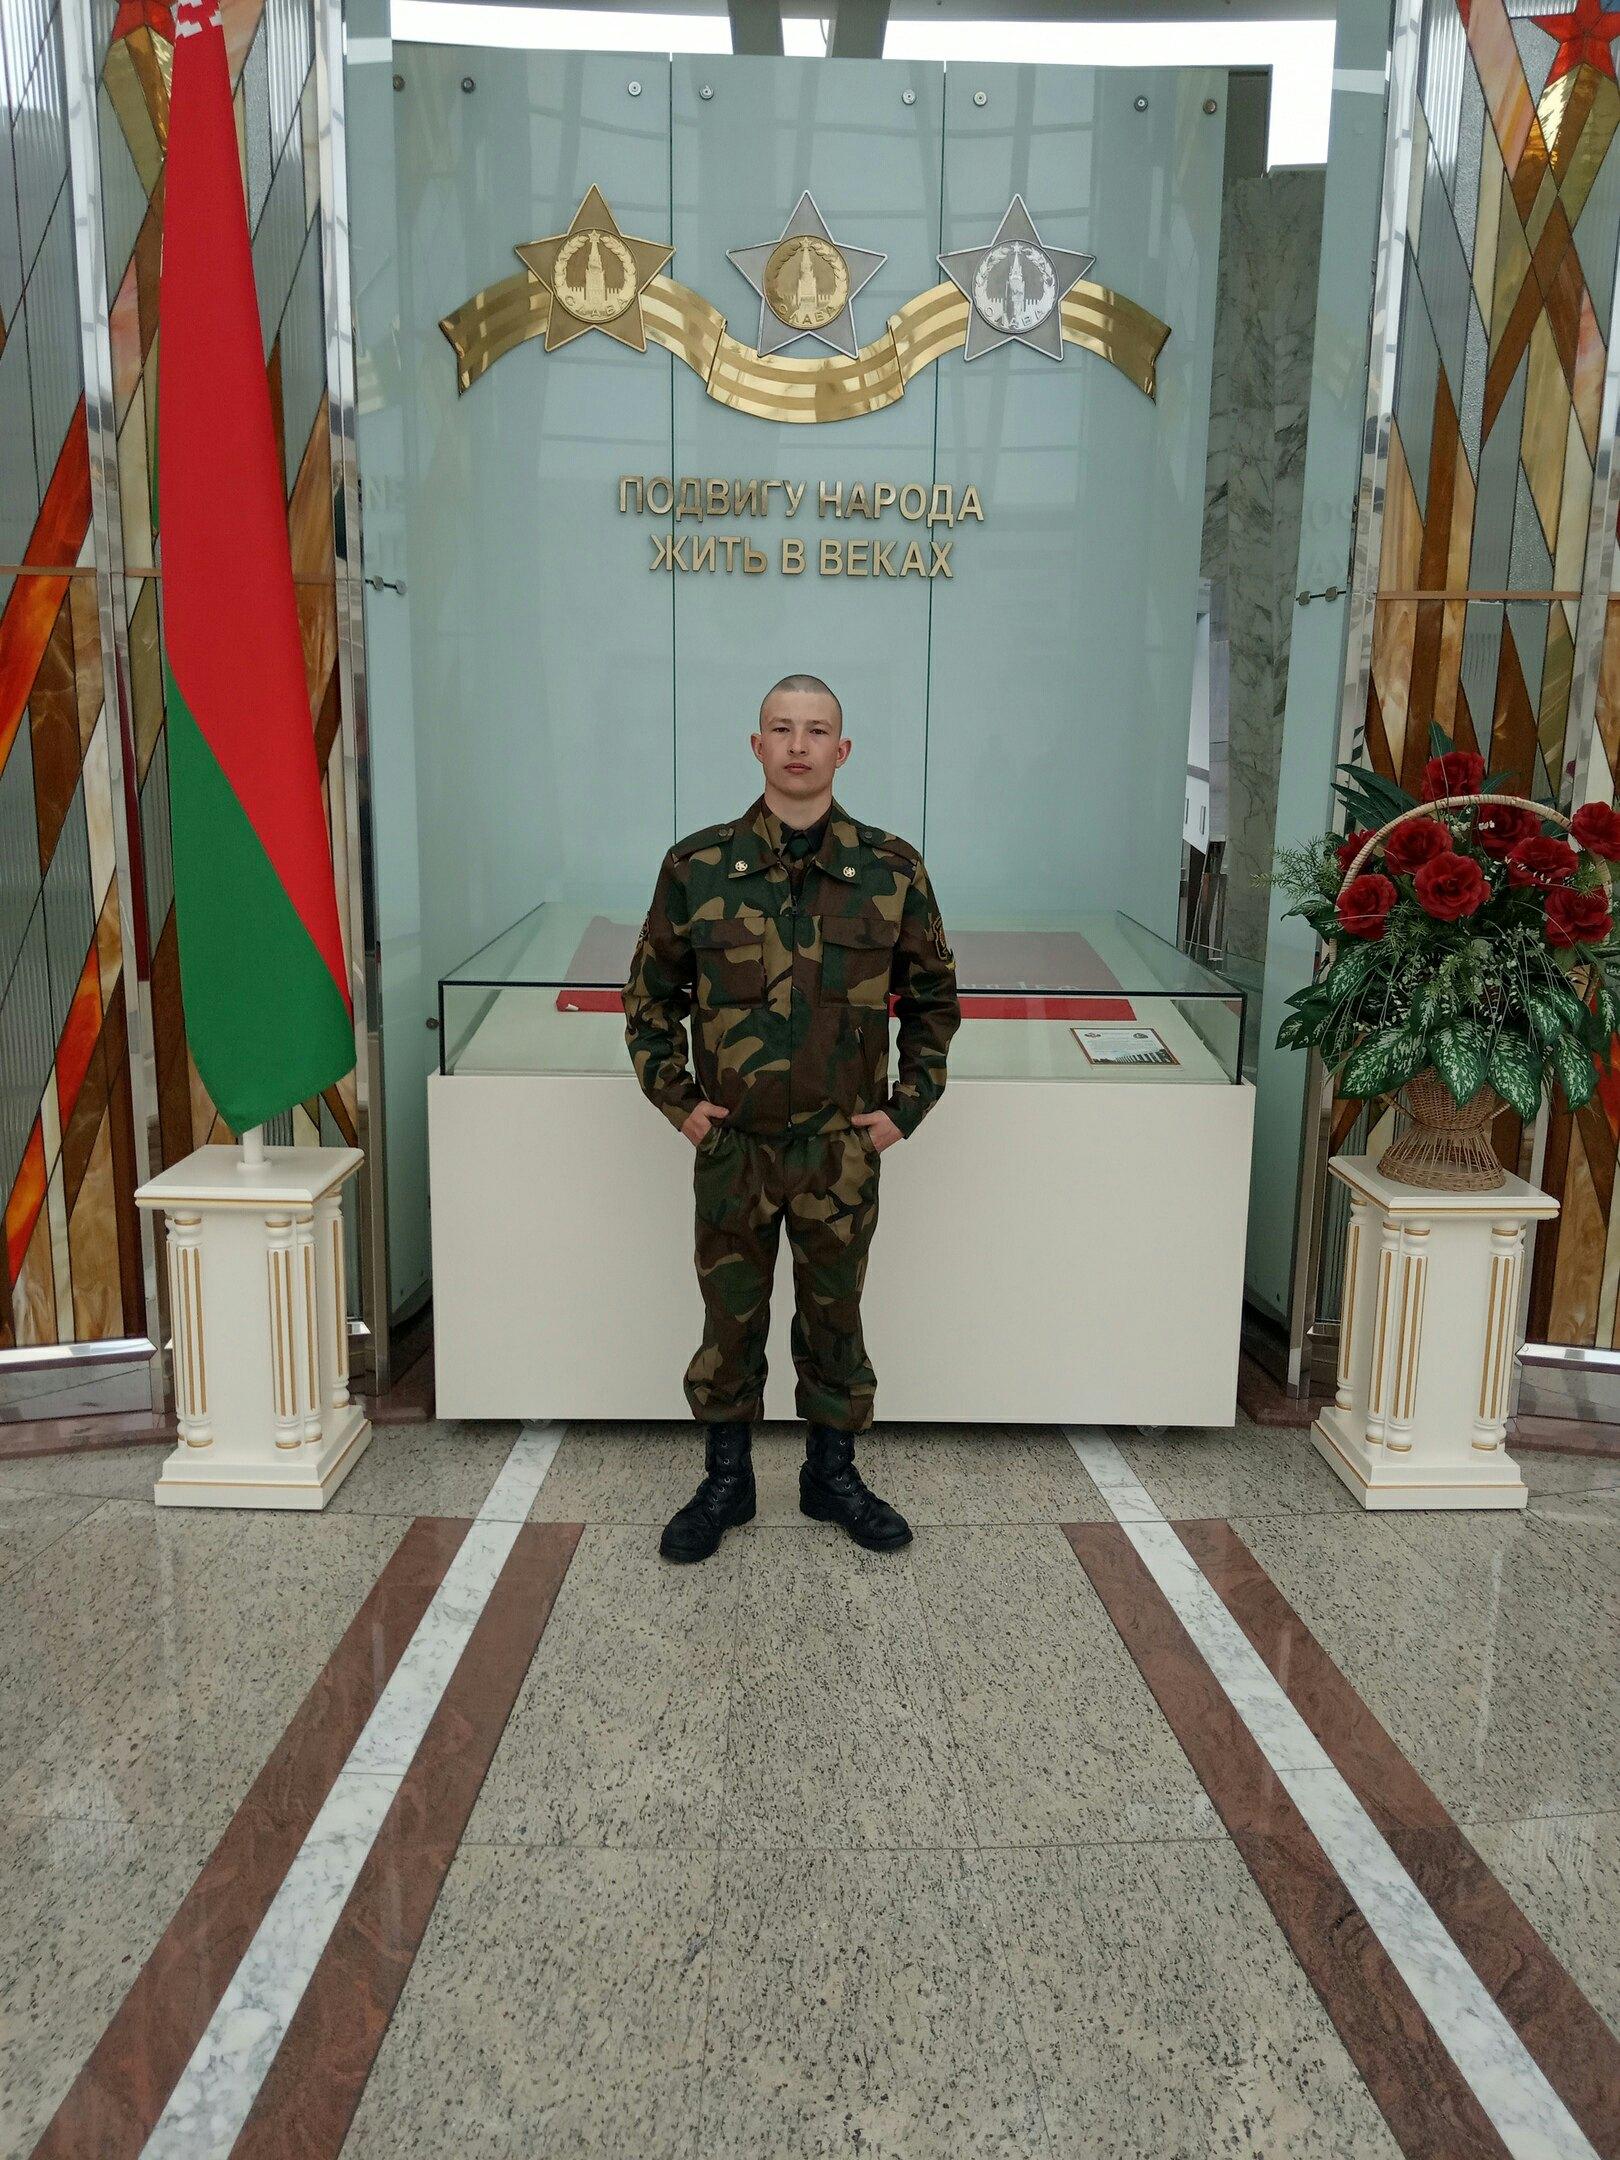 Dimon, 21, Khotsimsk